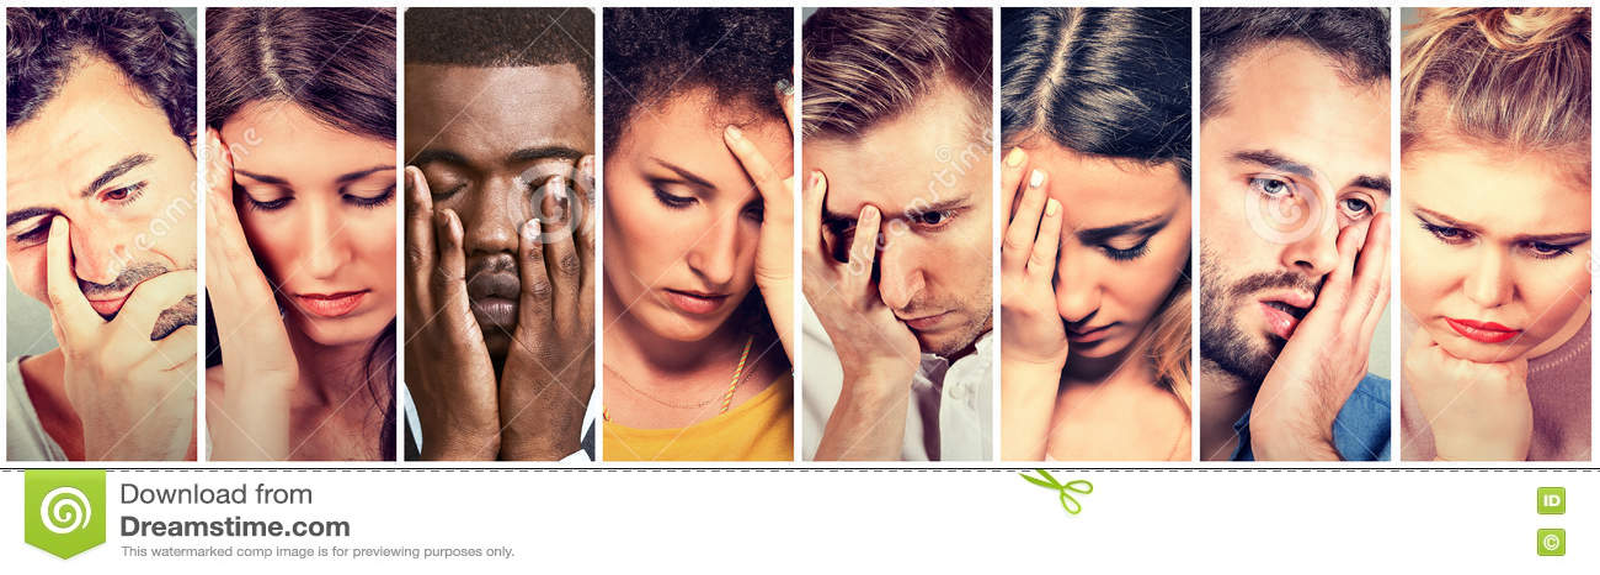 Group of sad depressed people. Unhappy men women